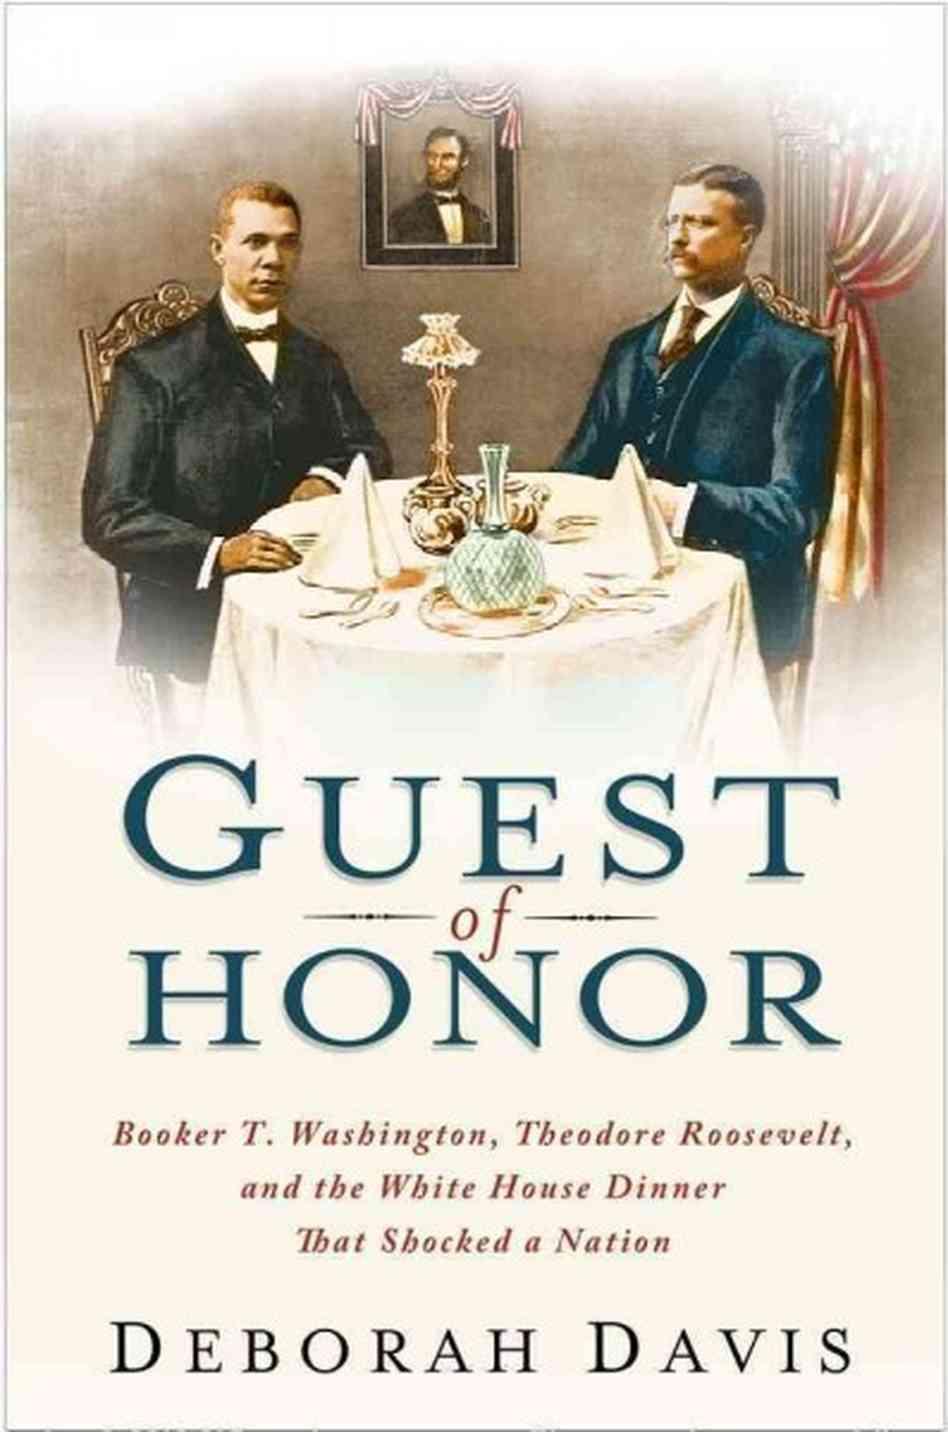 Honor Dinner Invitation Wording